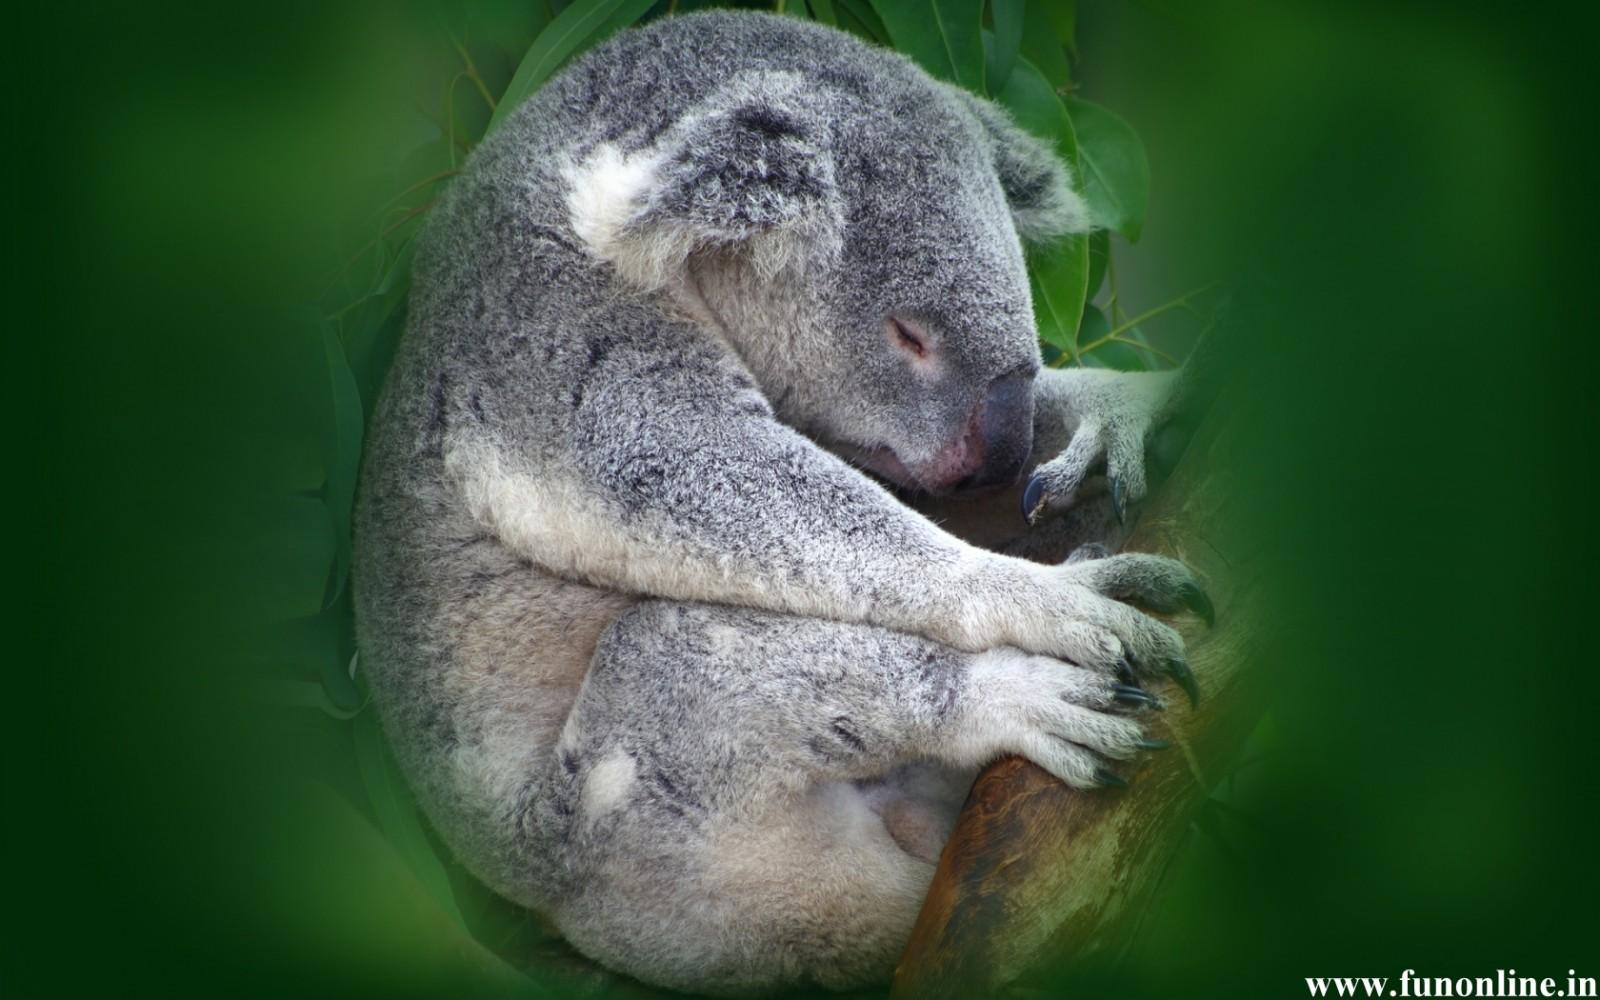 Koala Wallpapers, Download Free Cute and Pretty Koalas HD Wallpaper